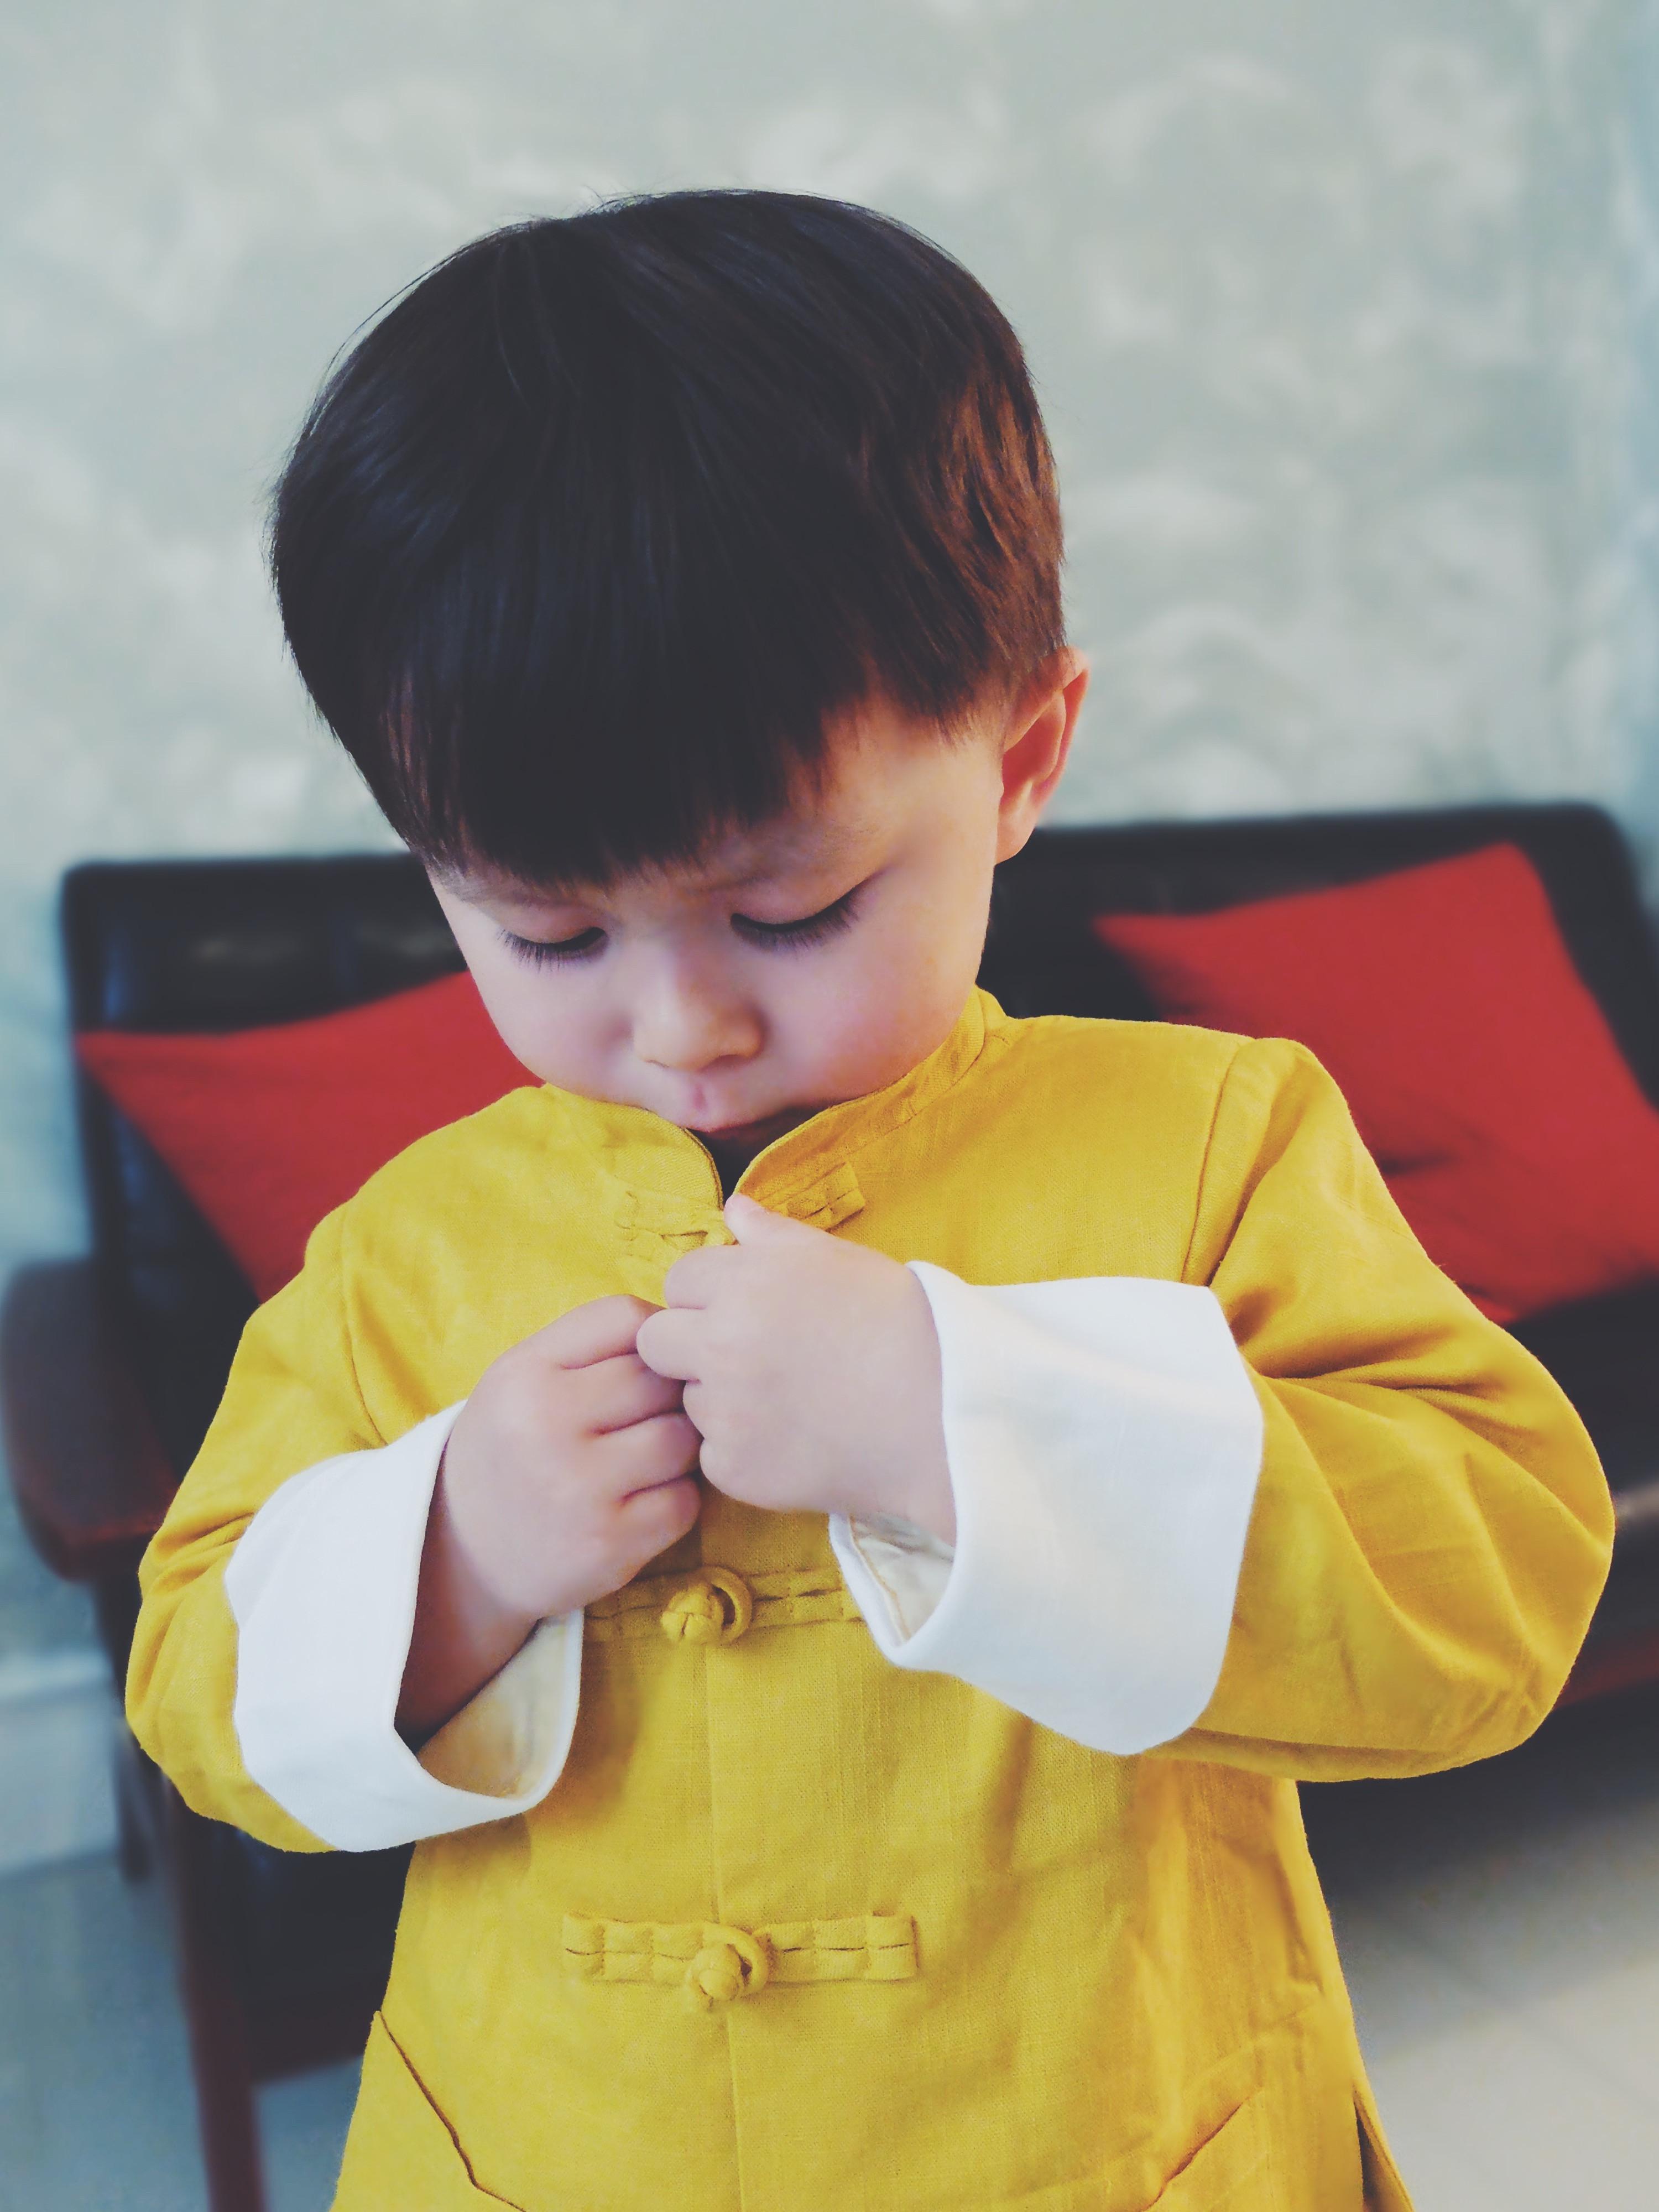 童裝旗袍/長衫租借 Kid Qipao/Cheongsam Rental